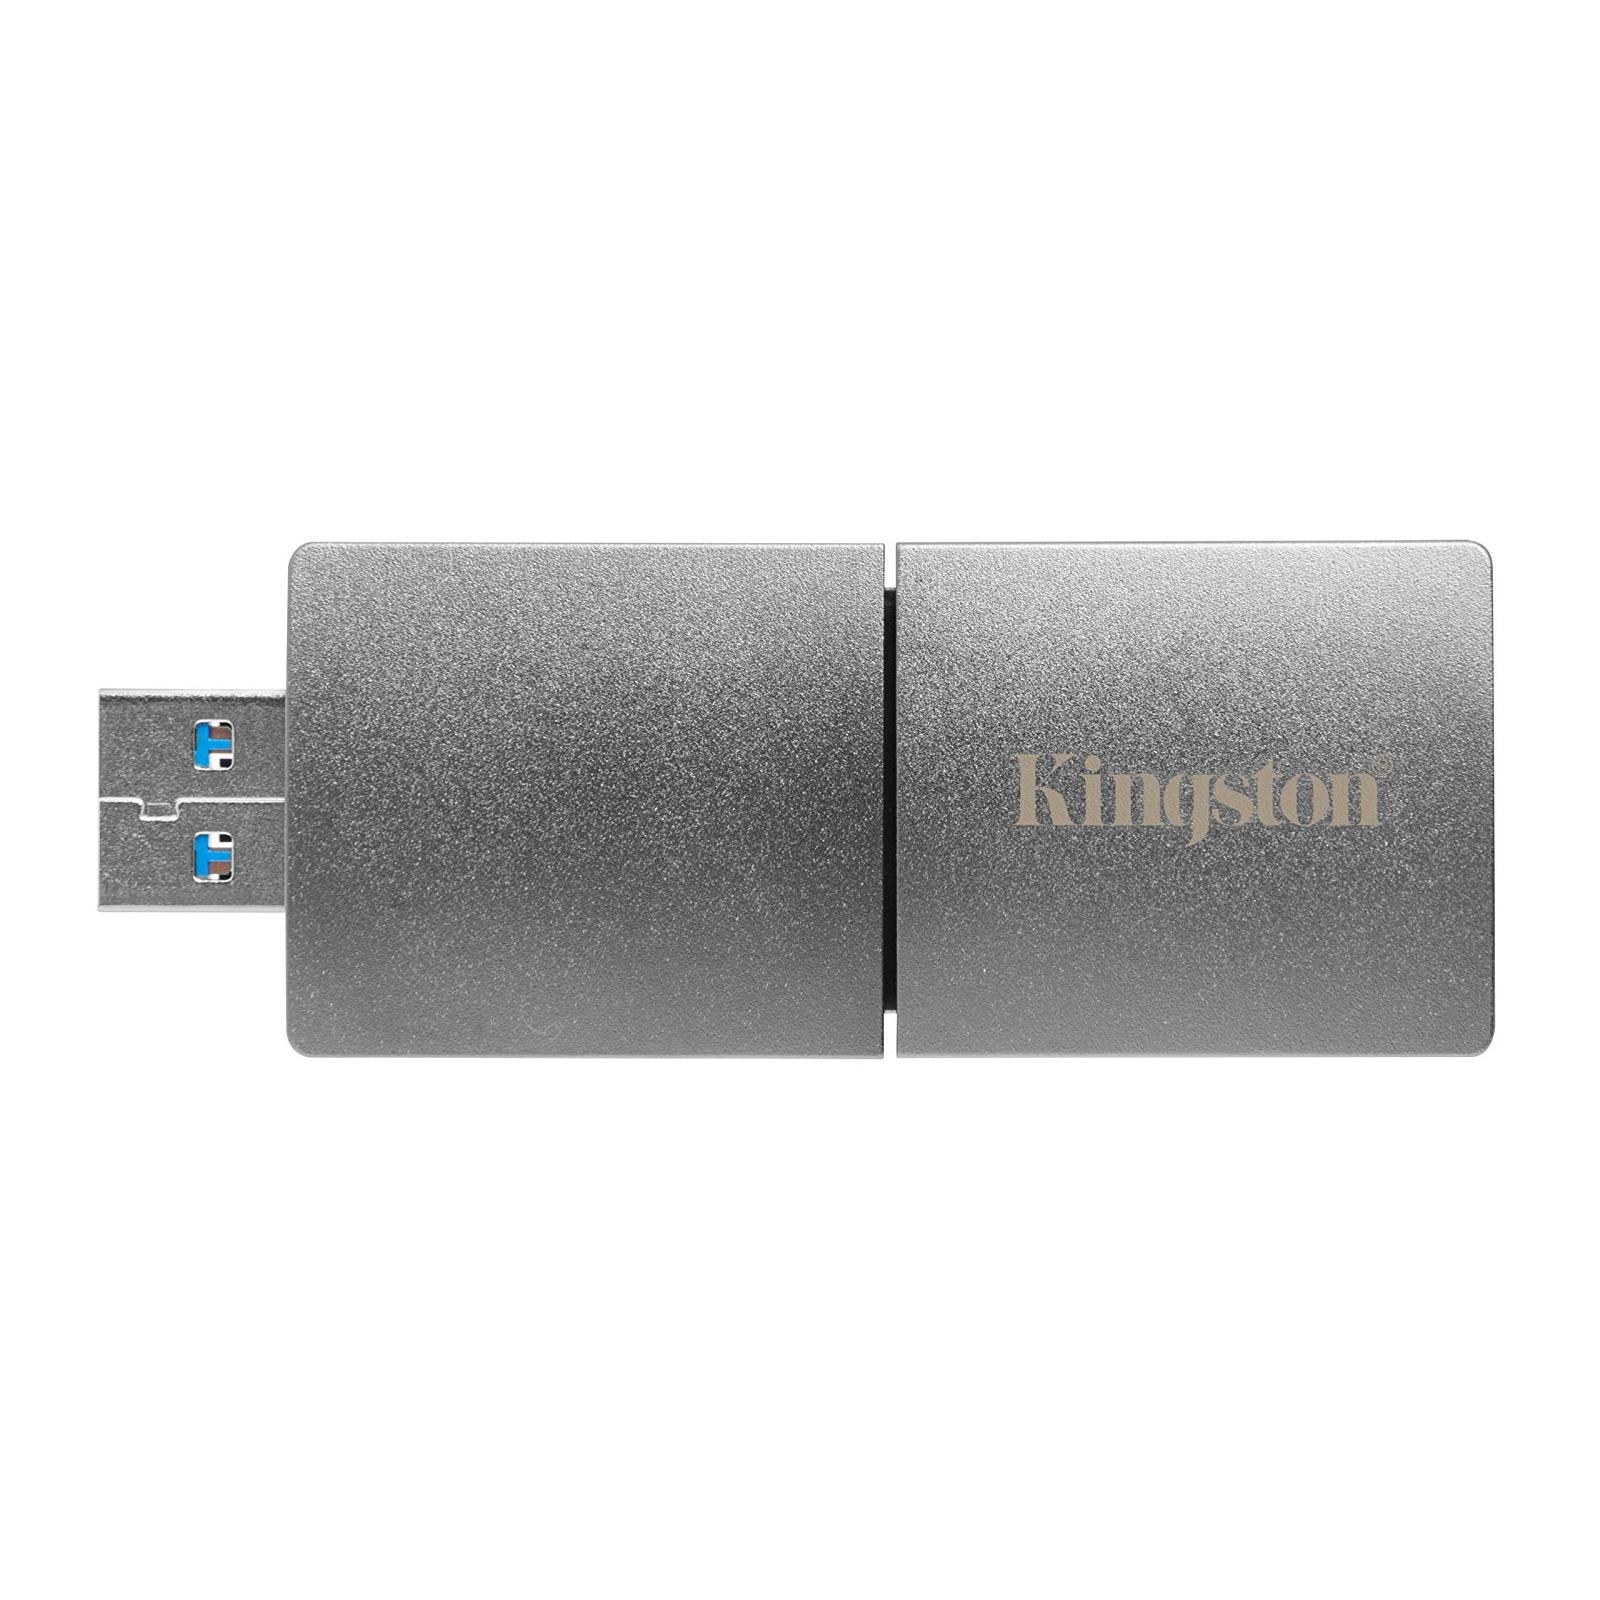 USB флеш накопитель Kingston 2TB DataTraveler Ultimate GT Metal Silver USB 3.1 (DTUGT/2TB) изображение 4